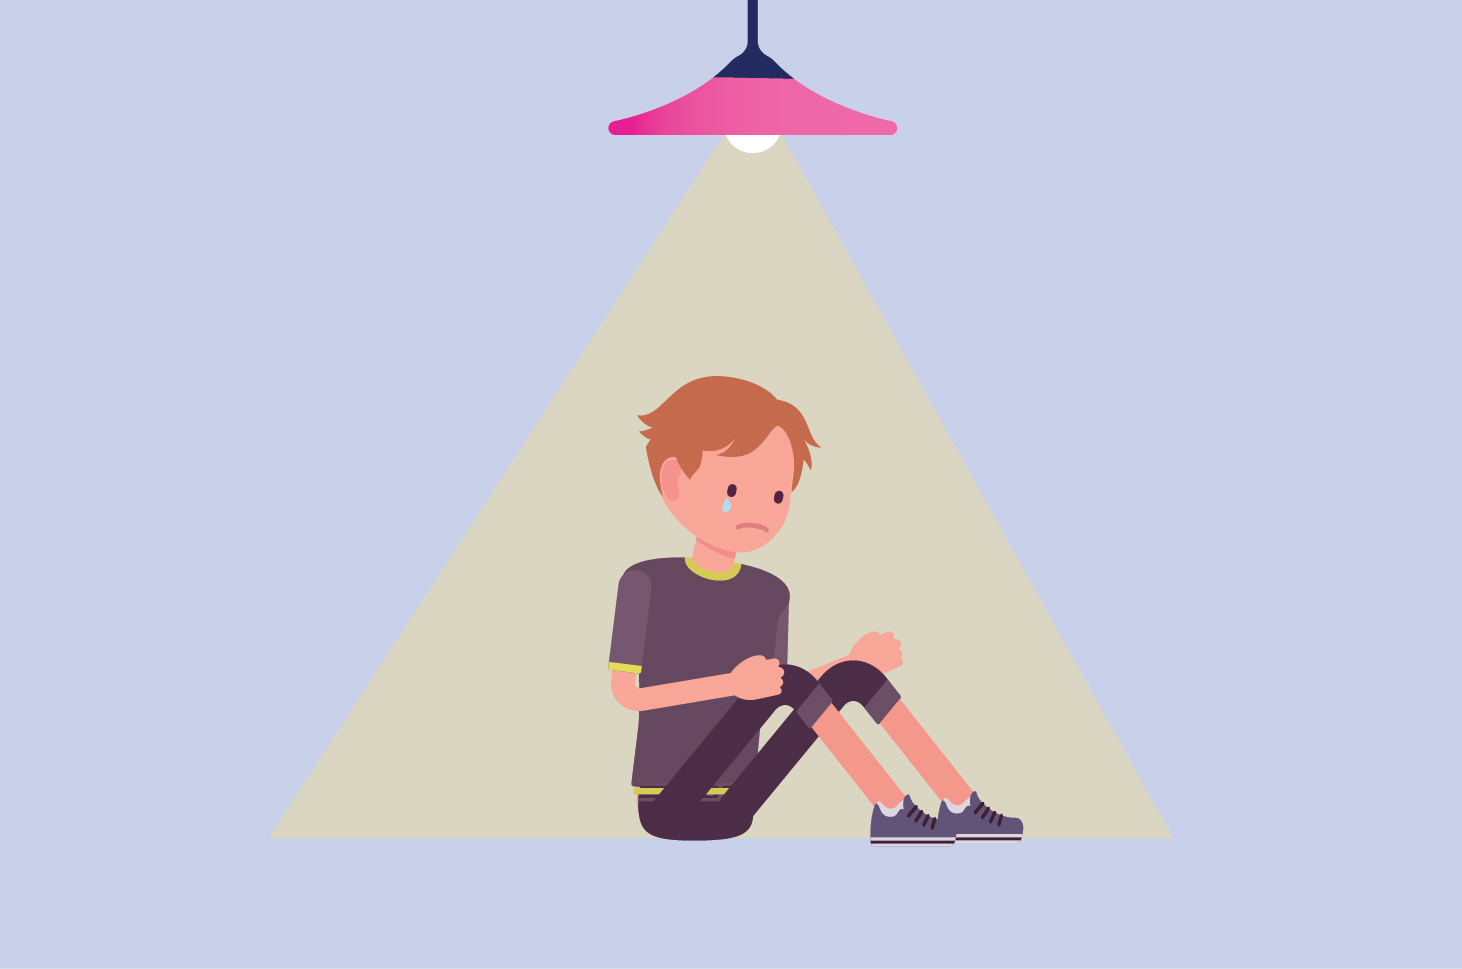 tumbuhkan-percaya-diri-pada-anak-pengidap-gagap-halodoc